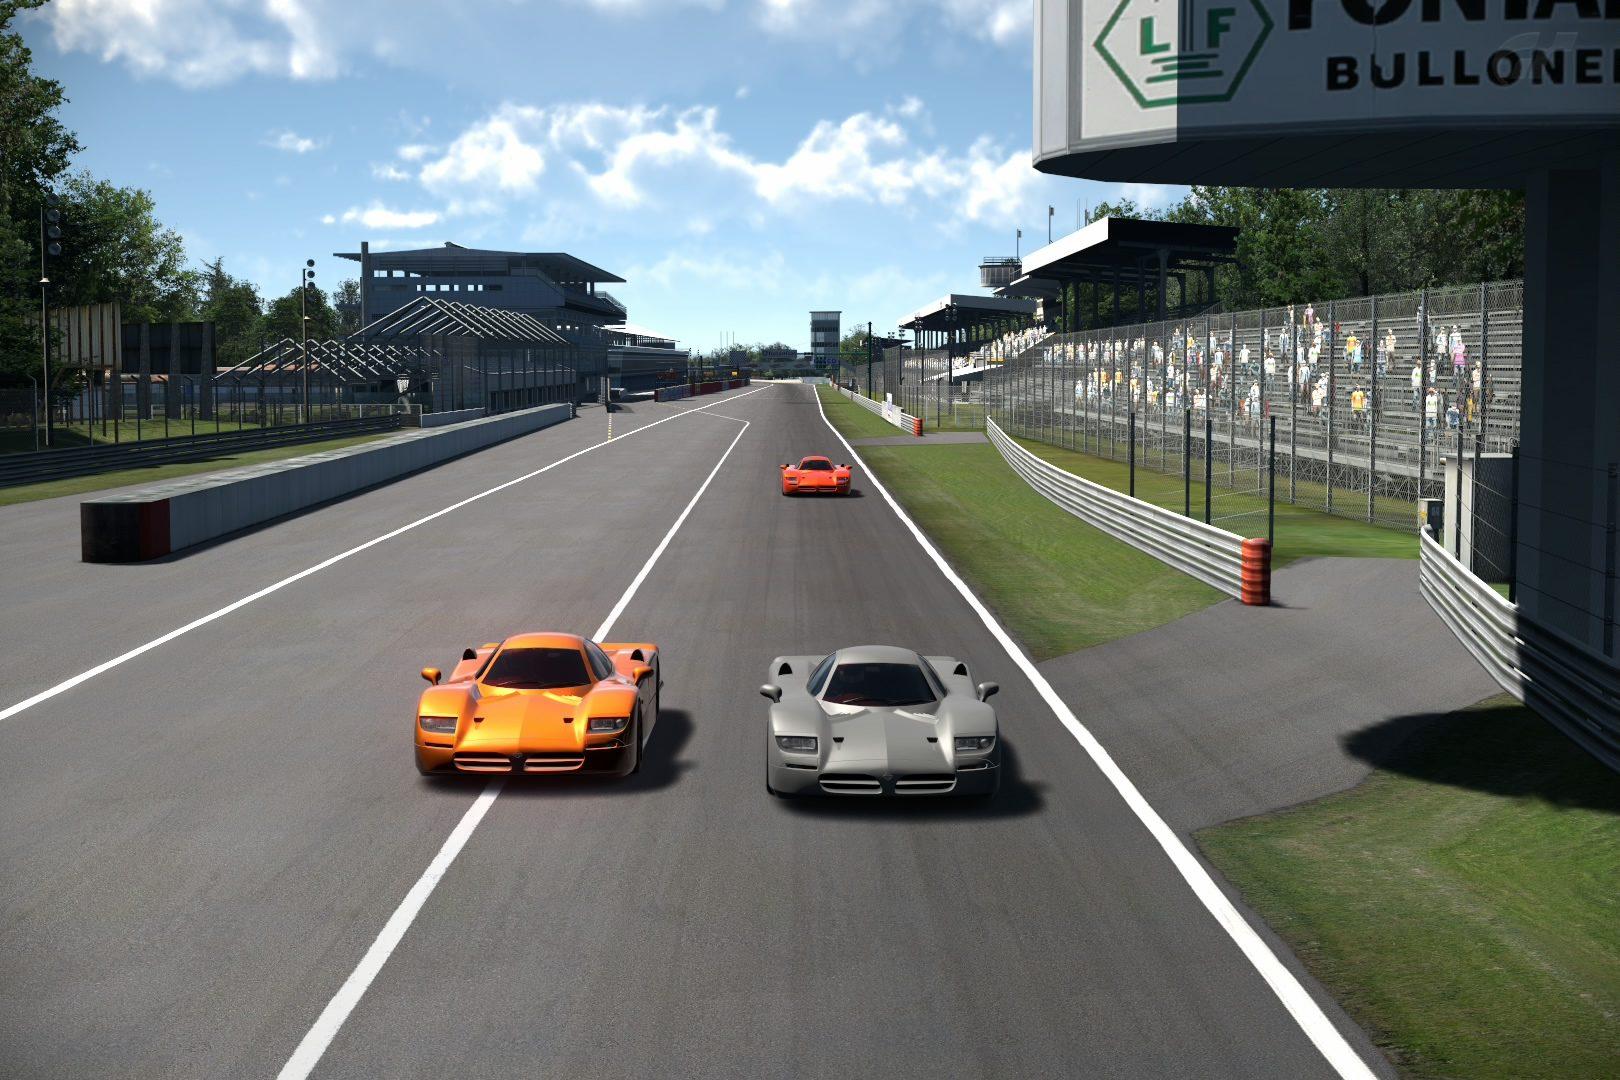 Autodromo Nazionale Monza_9.jpg